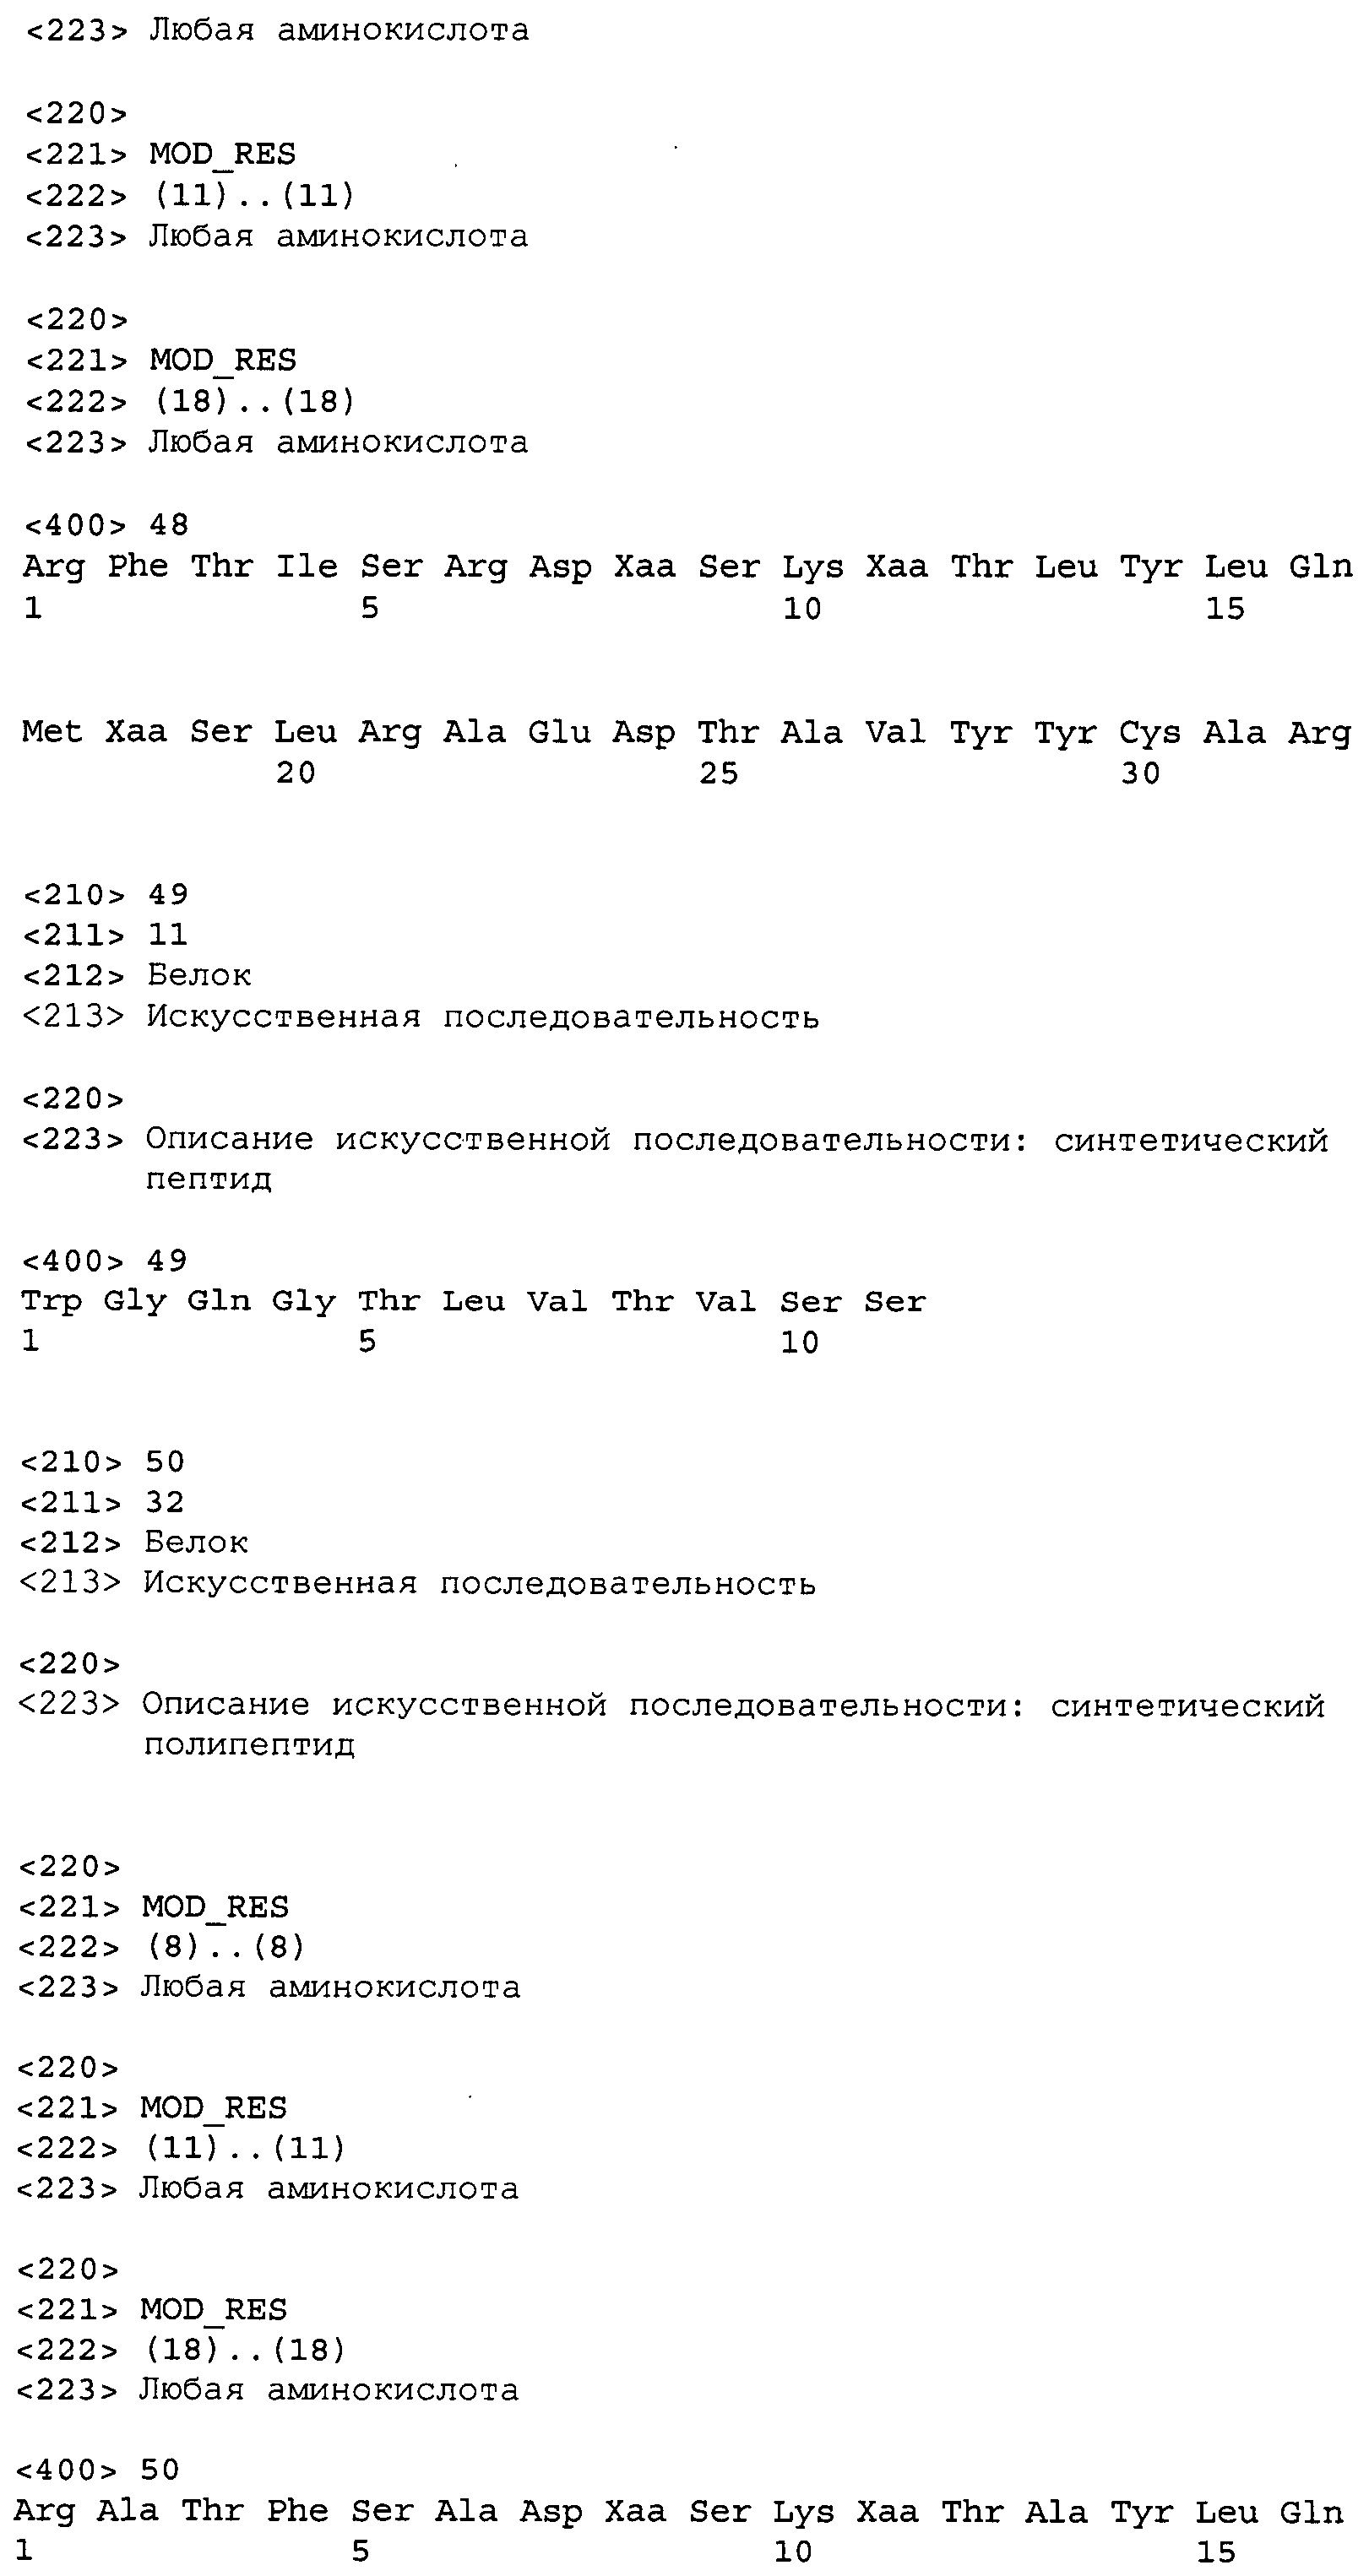 Figure 00000319